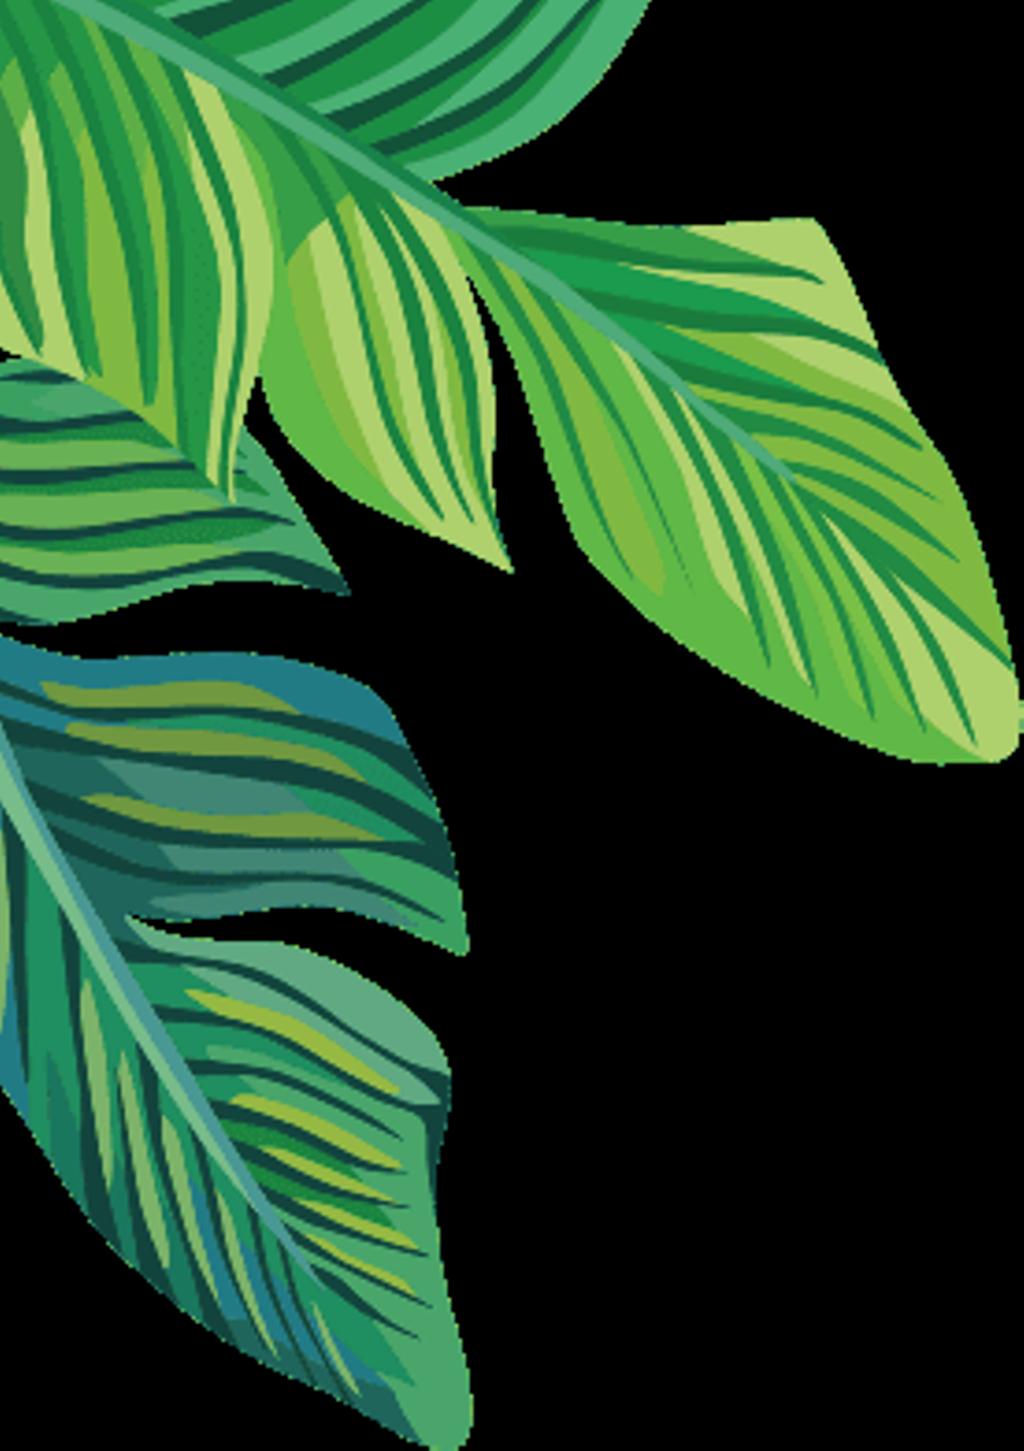 Tropical Plants Banana Leaves Freetoedit - Banana Leaf ...